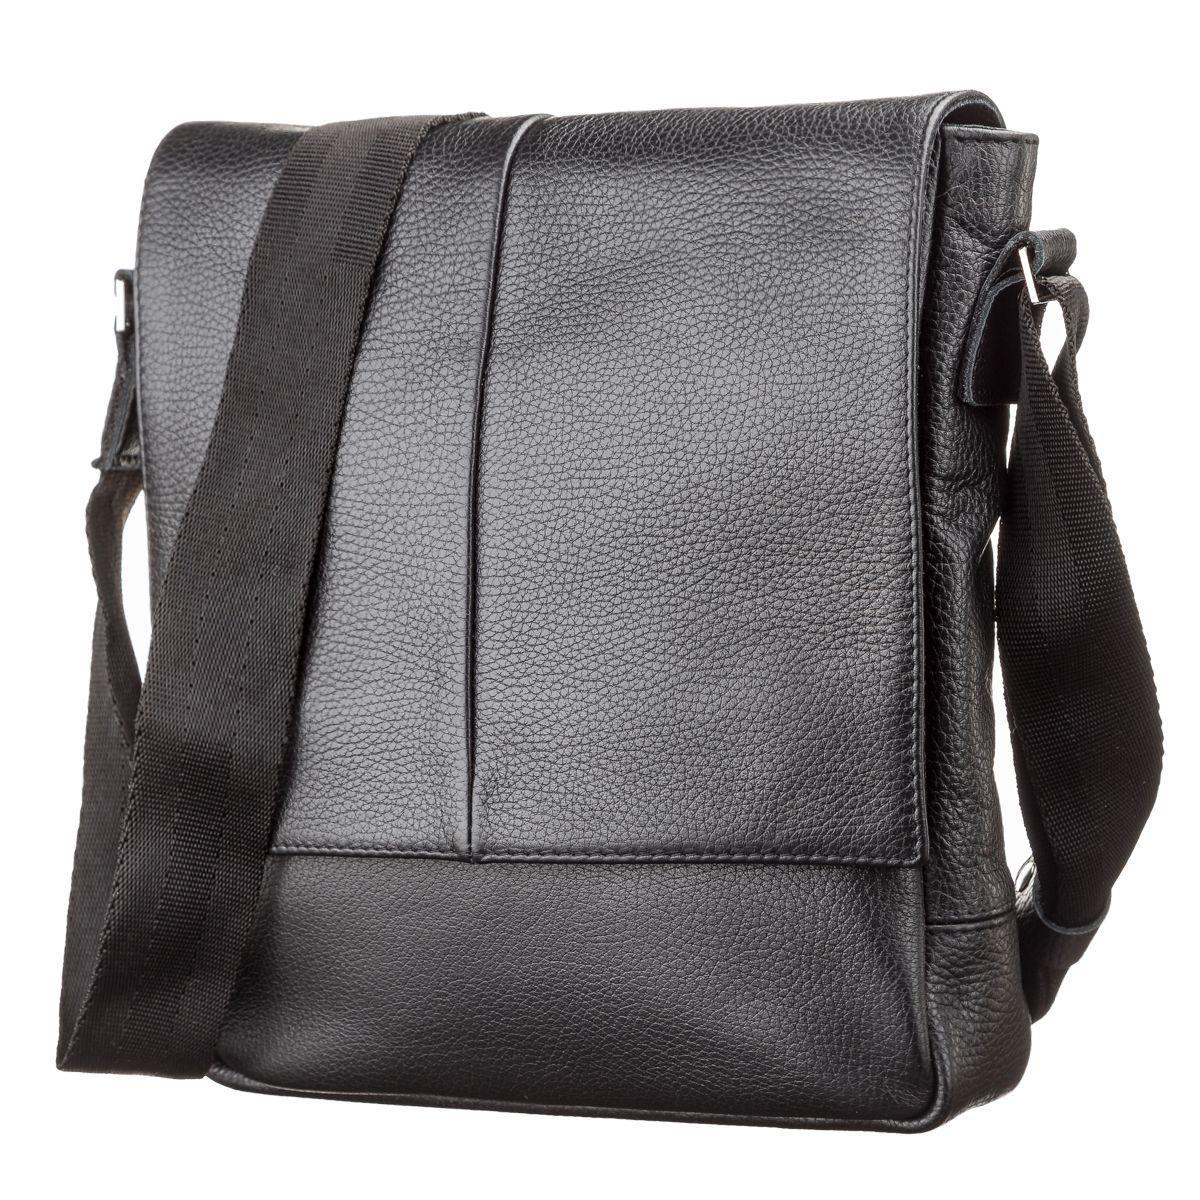 154da0fa8d7a Черная мужская сумка кожаная через плечо SHVIGEL 00861 - Цена ...